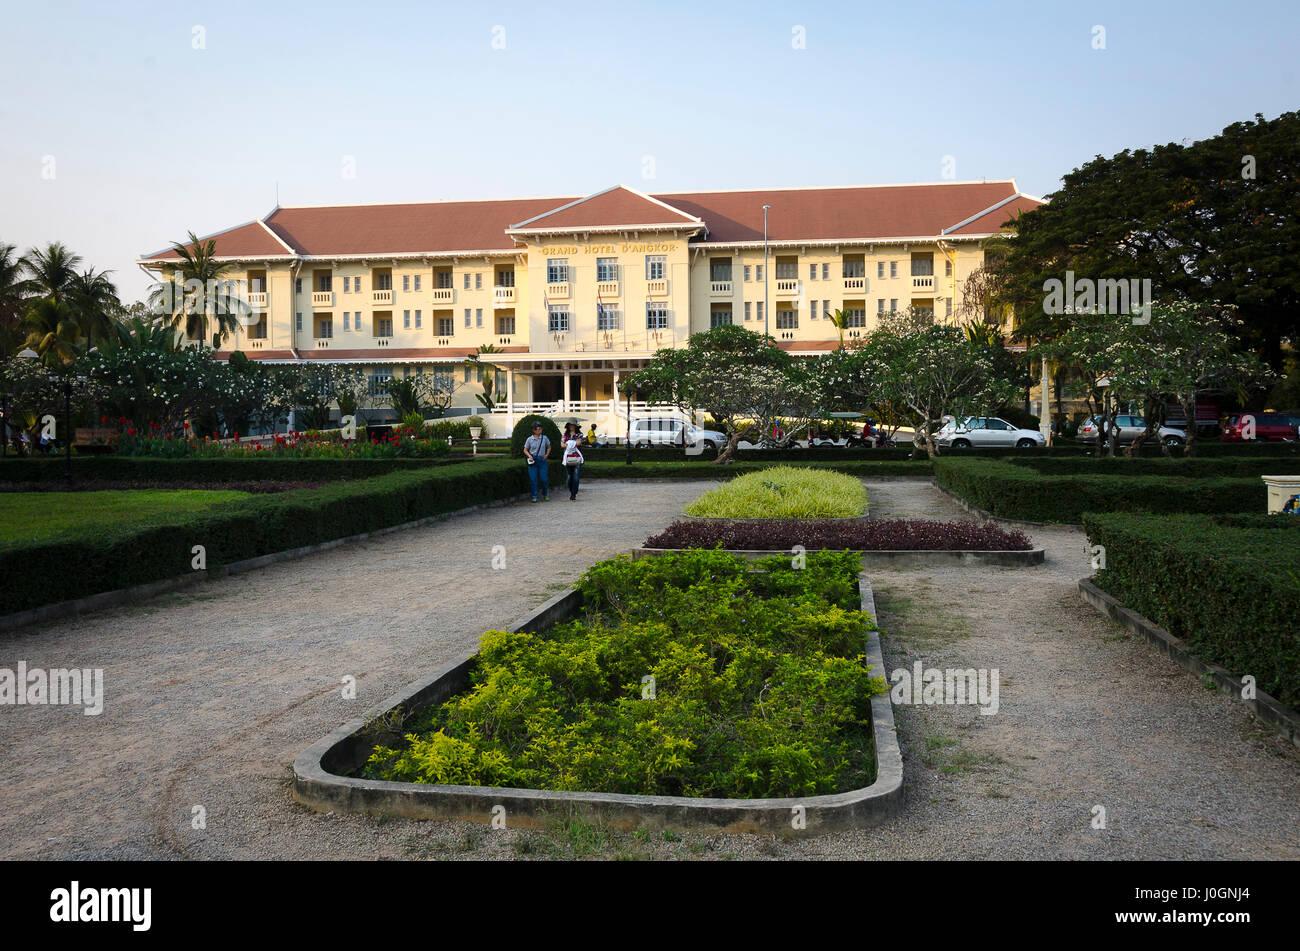 Raffles Grand Hotel D Angkor Royal Gardens Siem Reap Cambodia Stock Photo Alamy